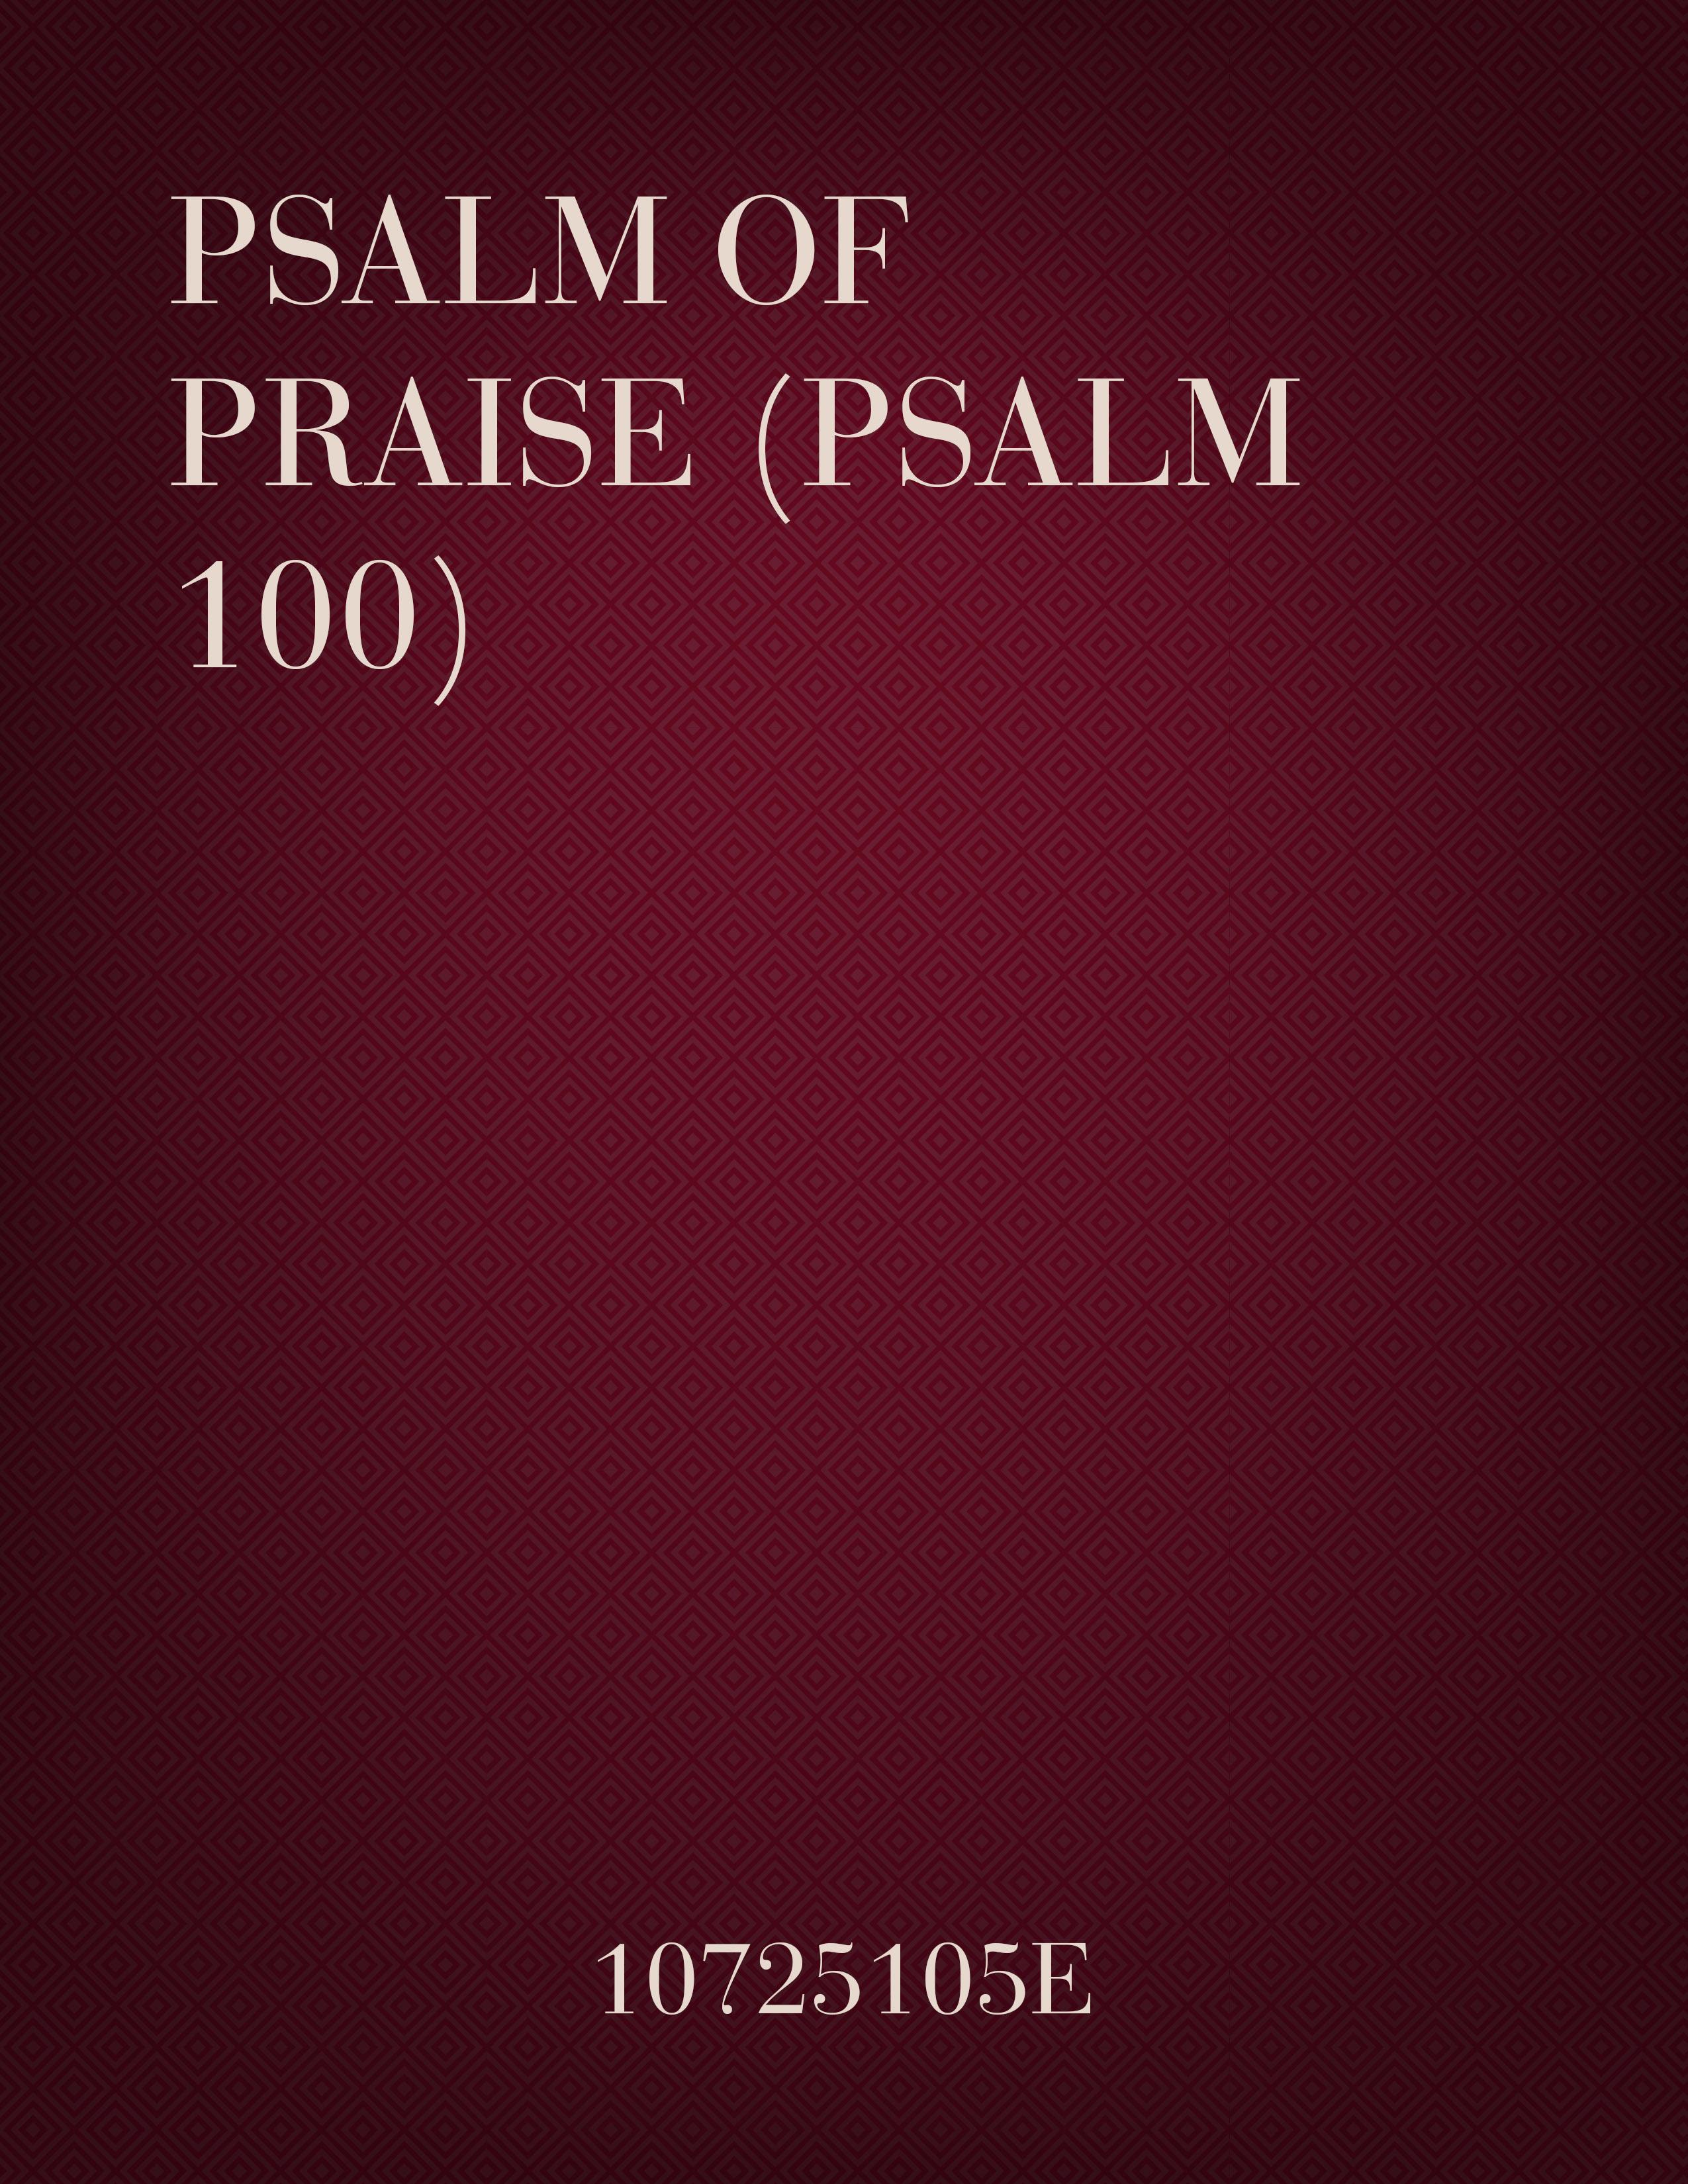 Psalm Of Praise (Psalm 100)